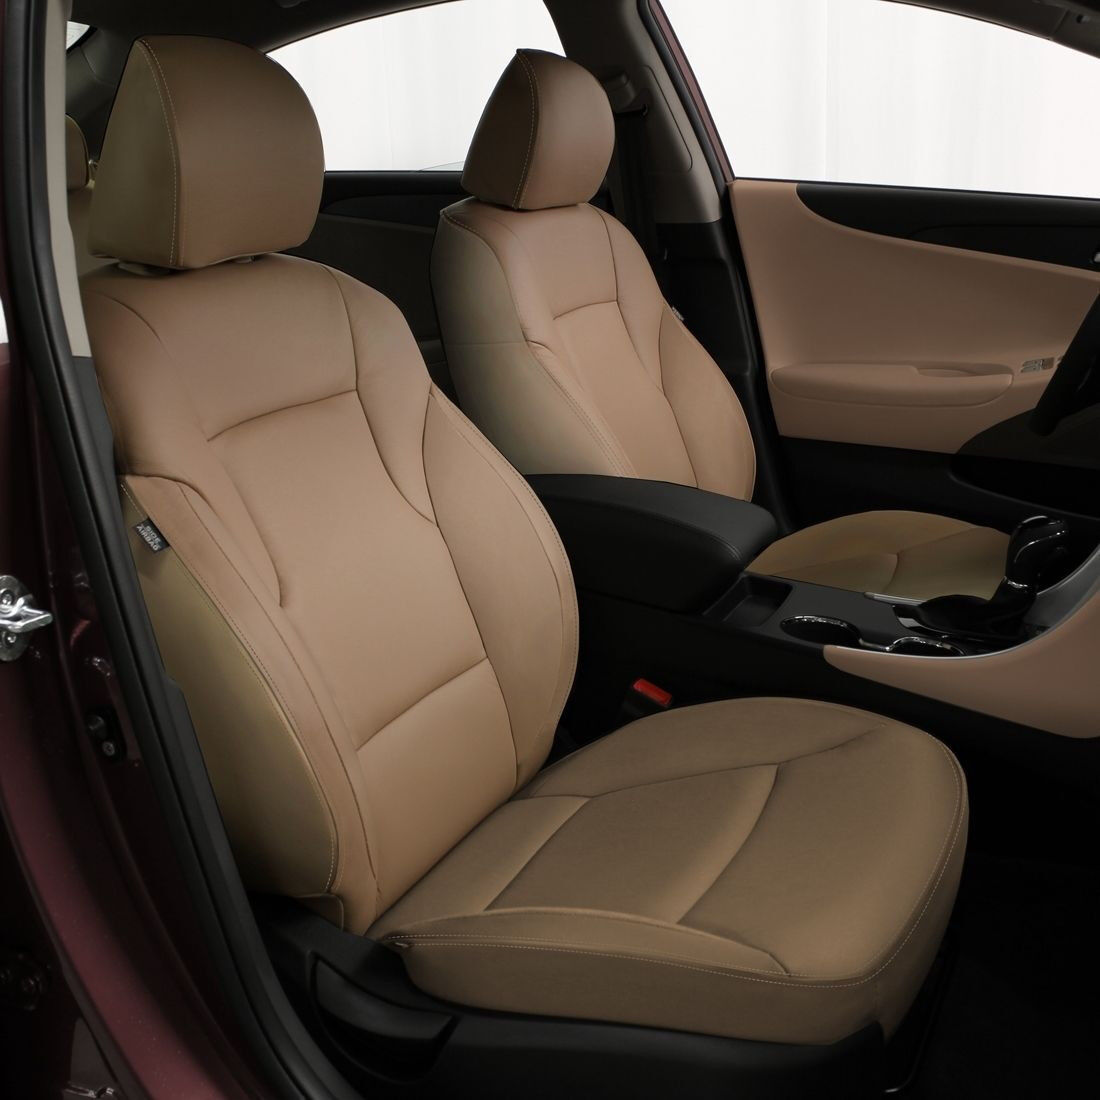 Details About Katzkin Tan Leather Replacement Seat Covers Fits 2017 Hyundai Sonata Gls Se